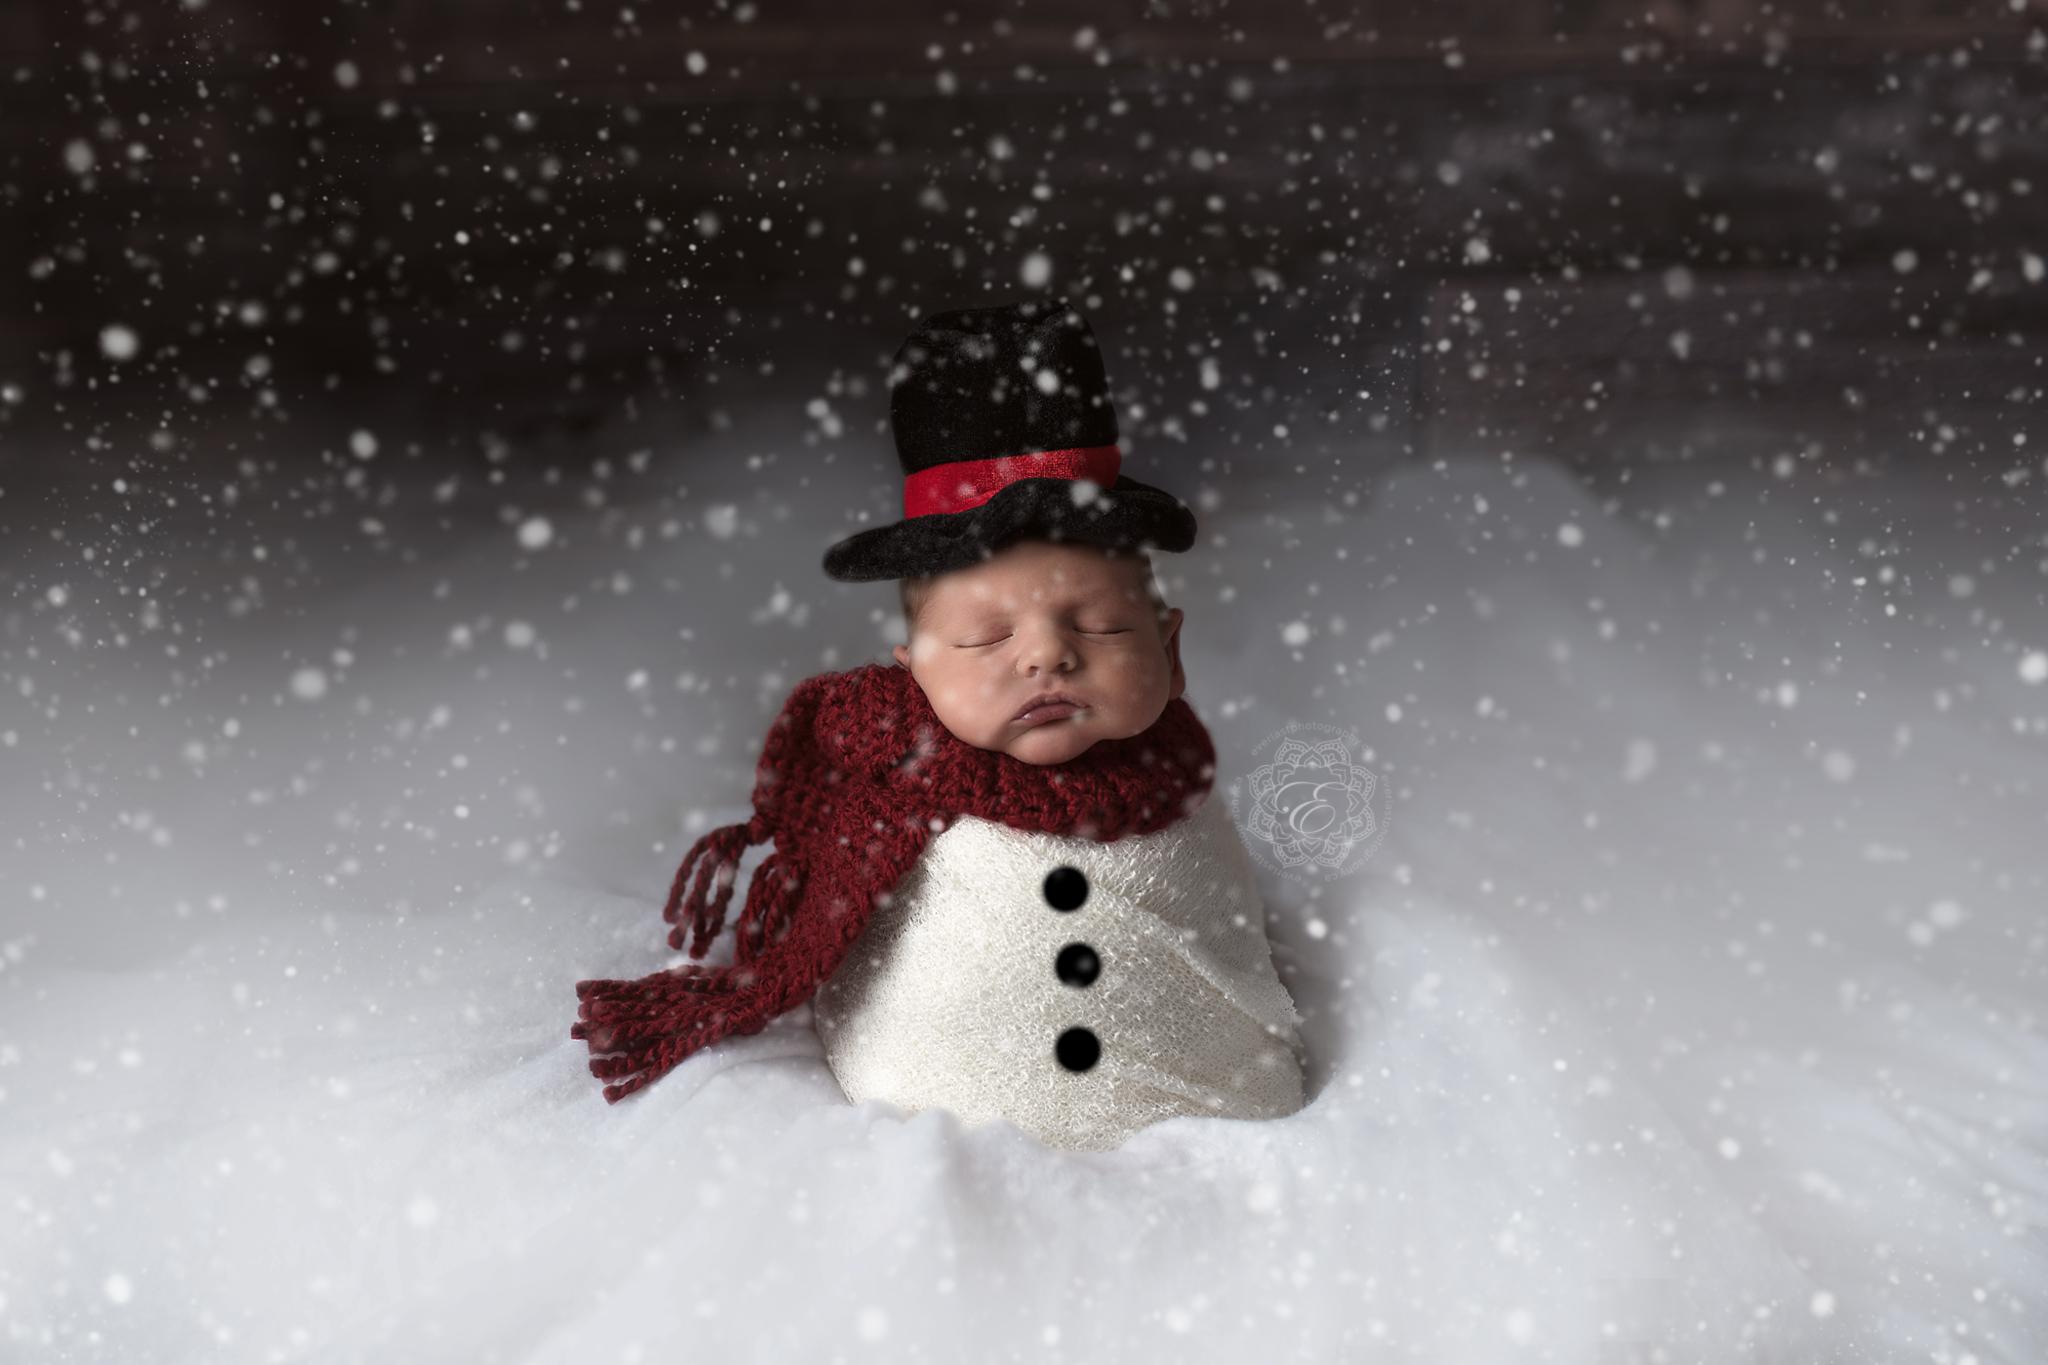 Snow falling on baby snowman